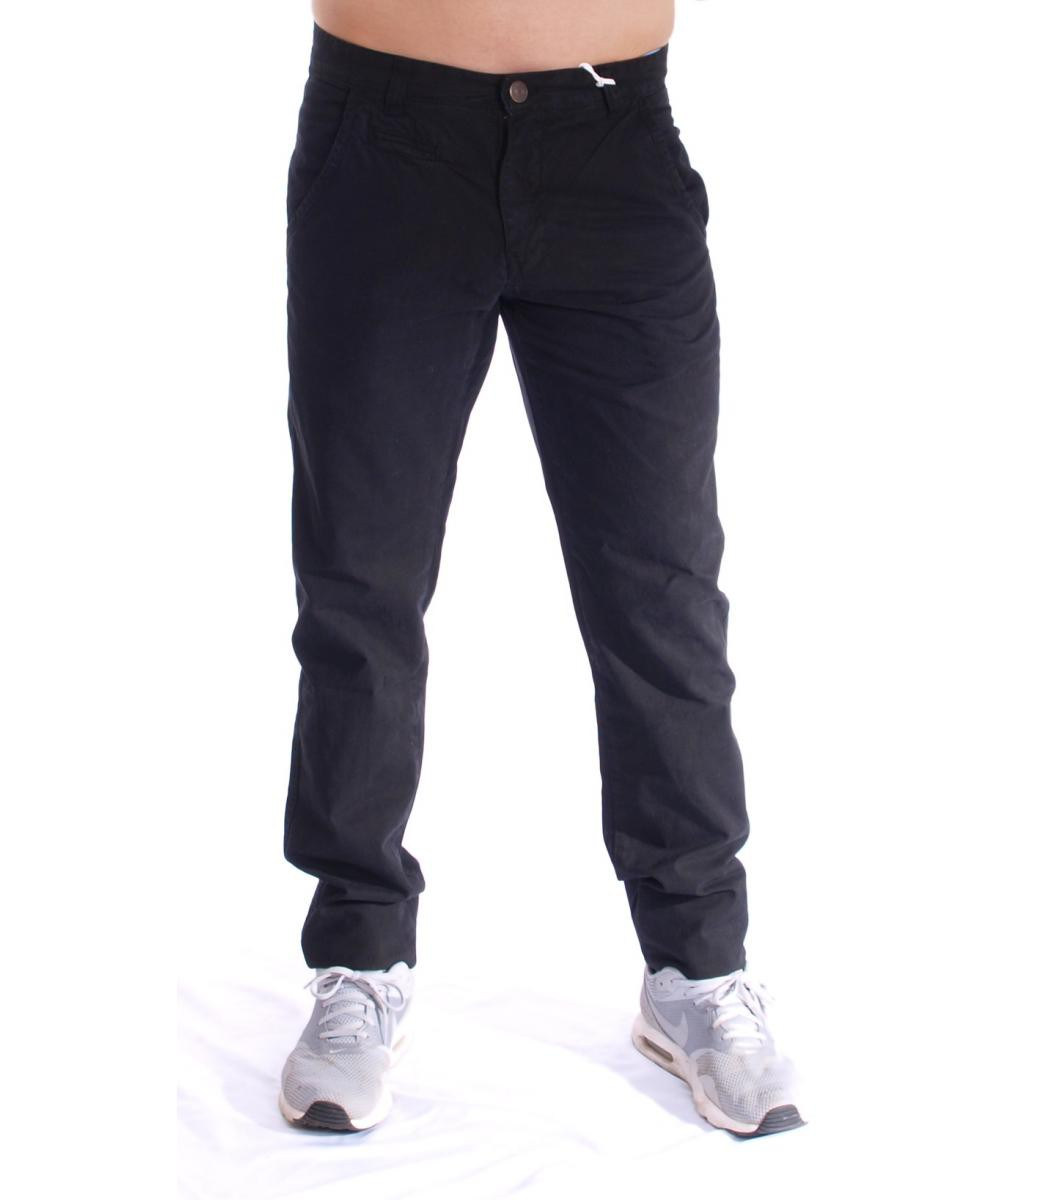 hailys herren denim jeans jako in schwarz. Black Bedroom Furniture Sets. Home Design Ideas